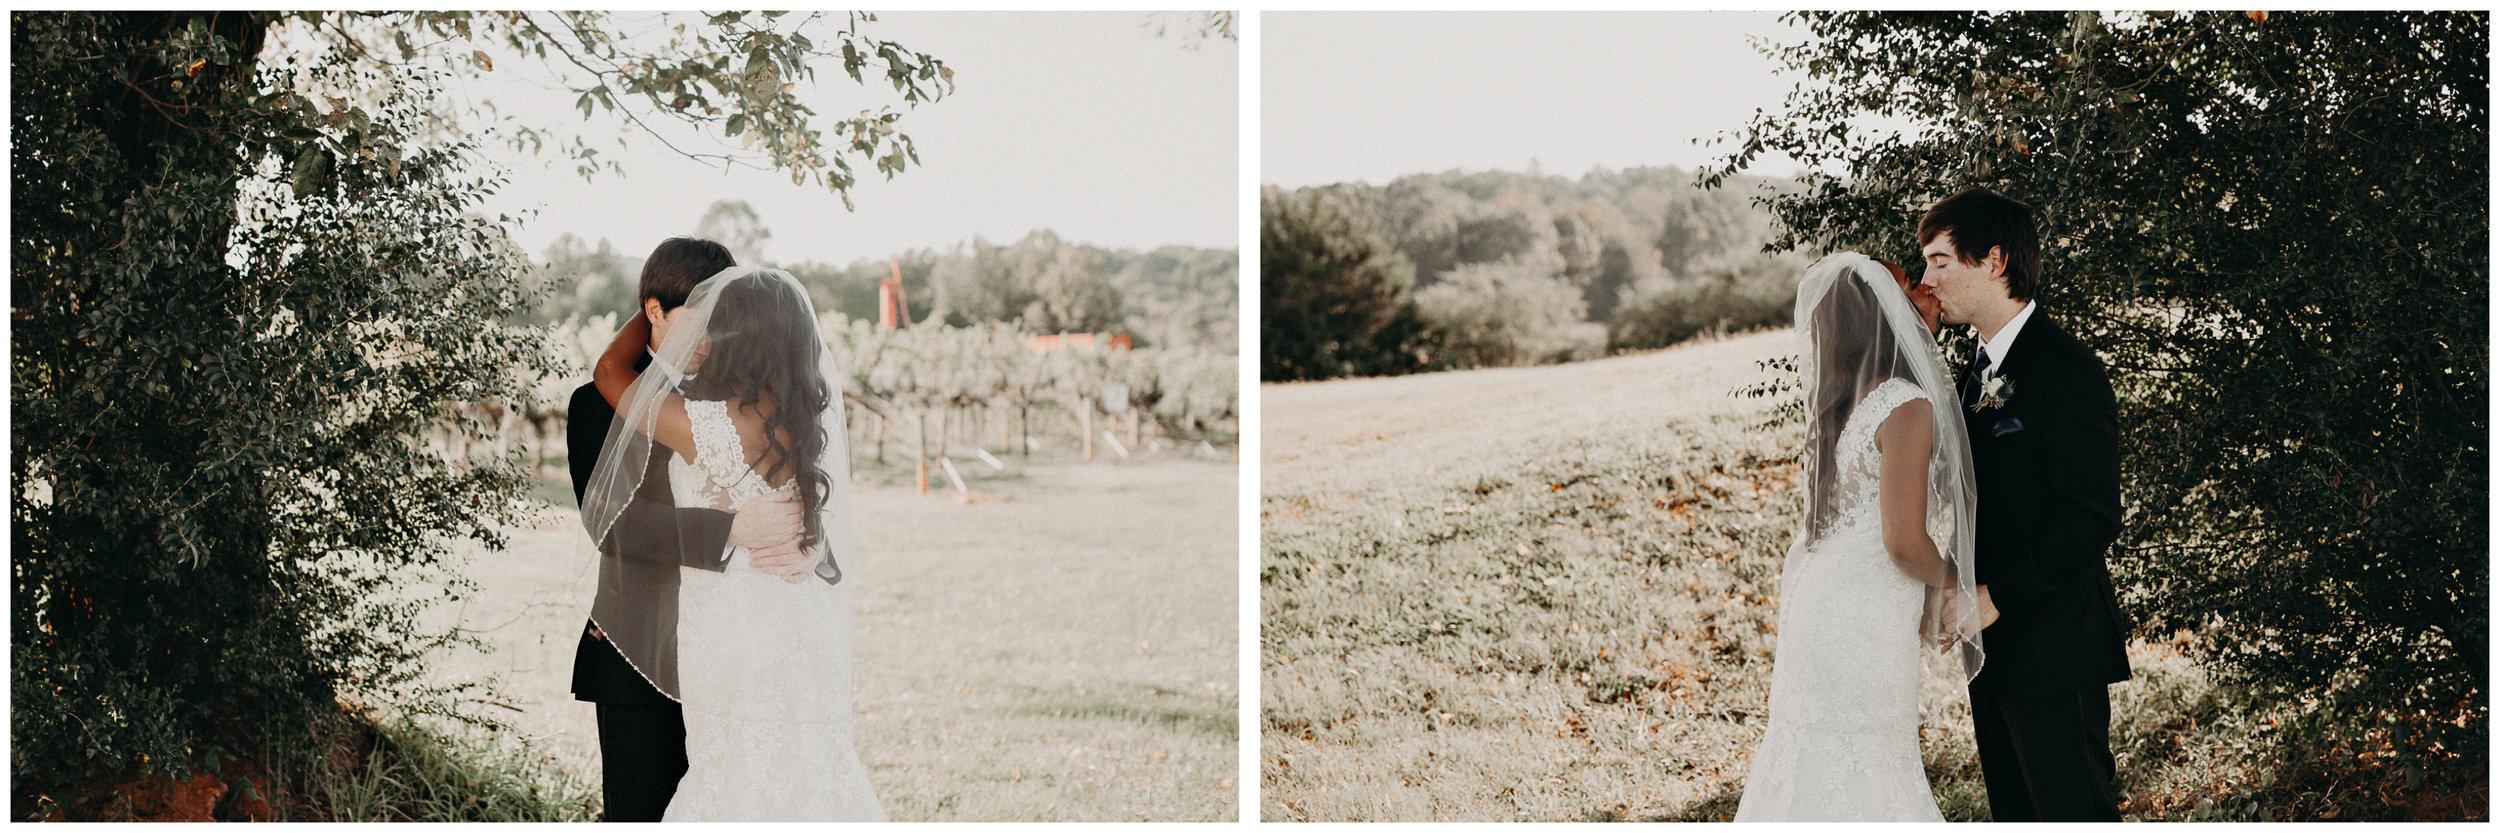 34- Wedding_day_atlanta_georgia_Bride_and_groom_first_look_and_portraits_aline_marin_photography.jpg